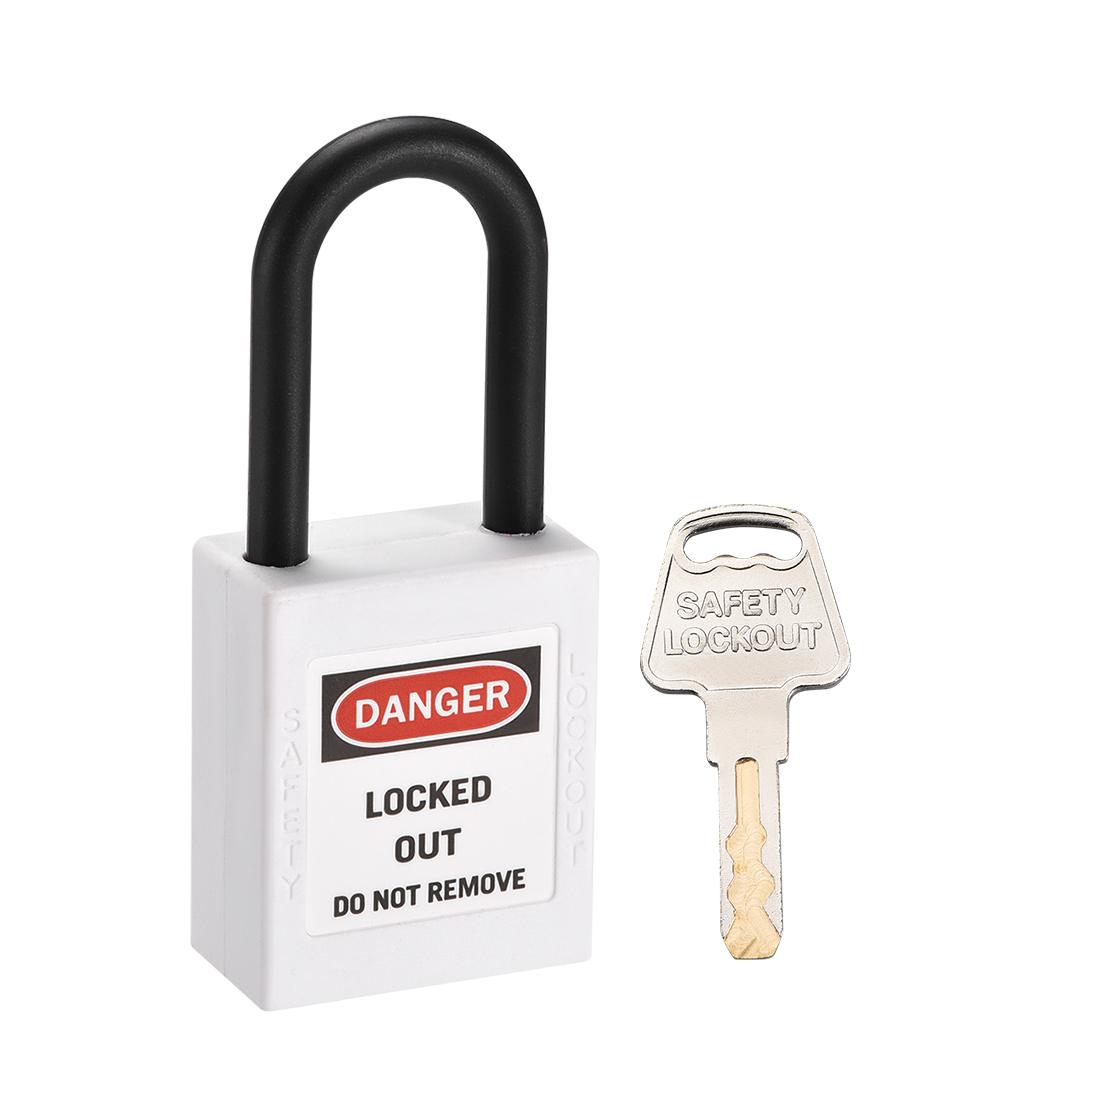 Lockout Tagout Locks, 1-1/2 Inch Shackle Key Alike Safety Padlock White